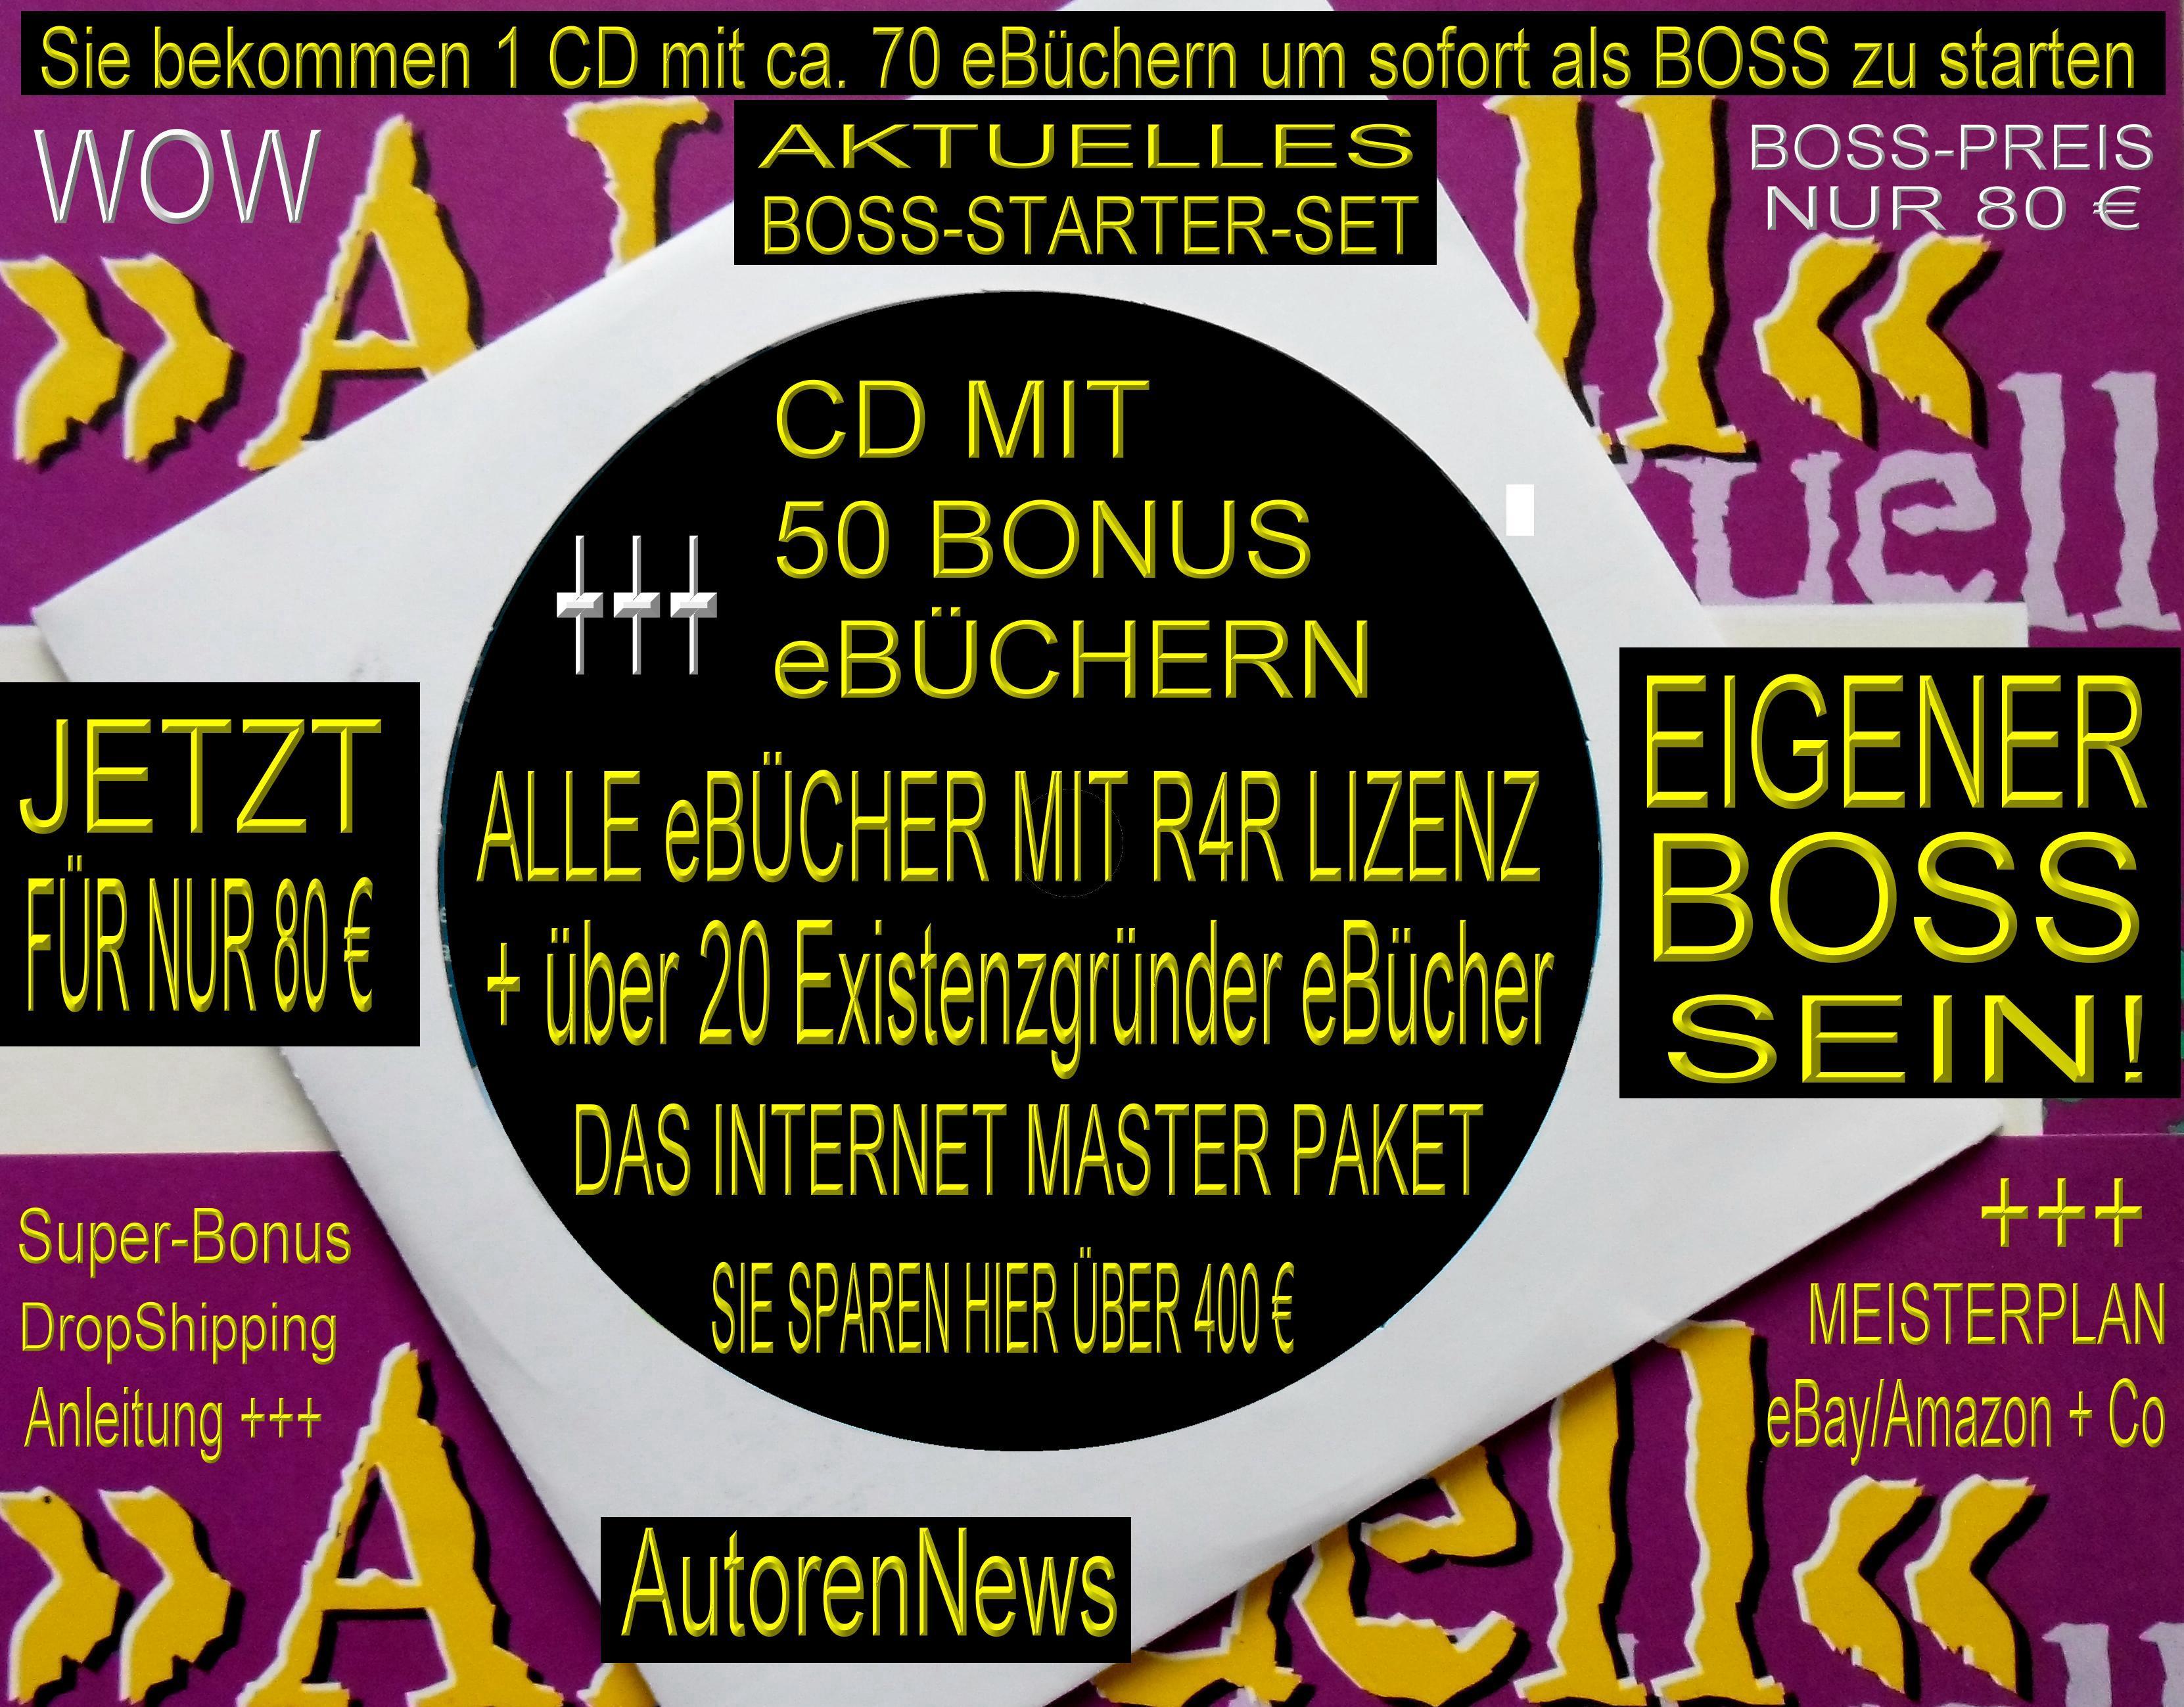 http://geldebuch.beepworld.de/files/ALLEeBuecher/ALLEMeisnereBook/cdbosssein80ca.70ebooks.jpg?nocache=0.9293898019585598